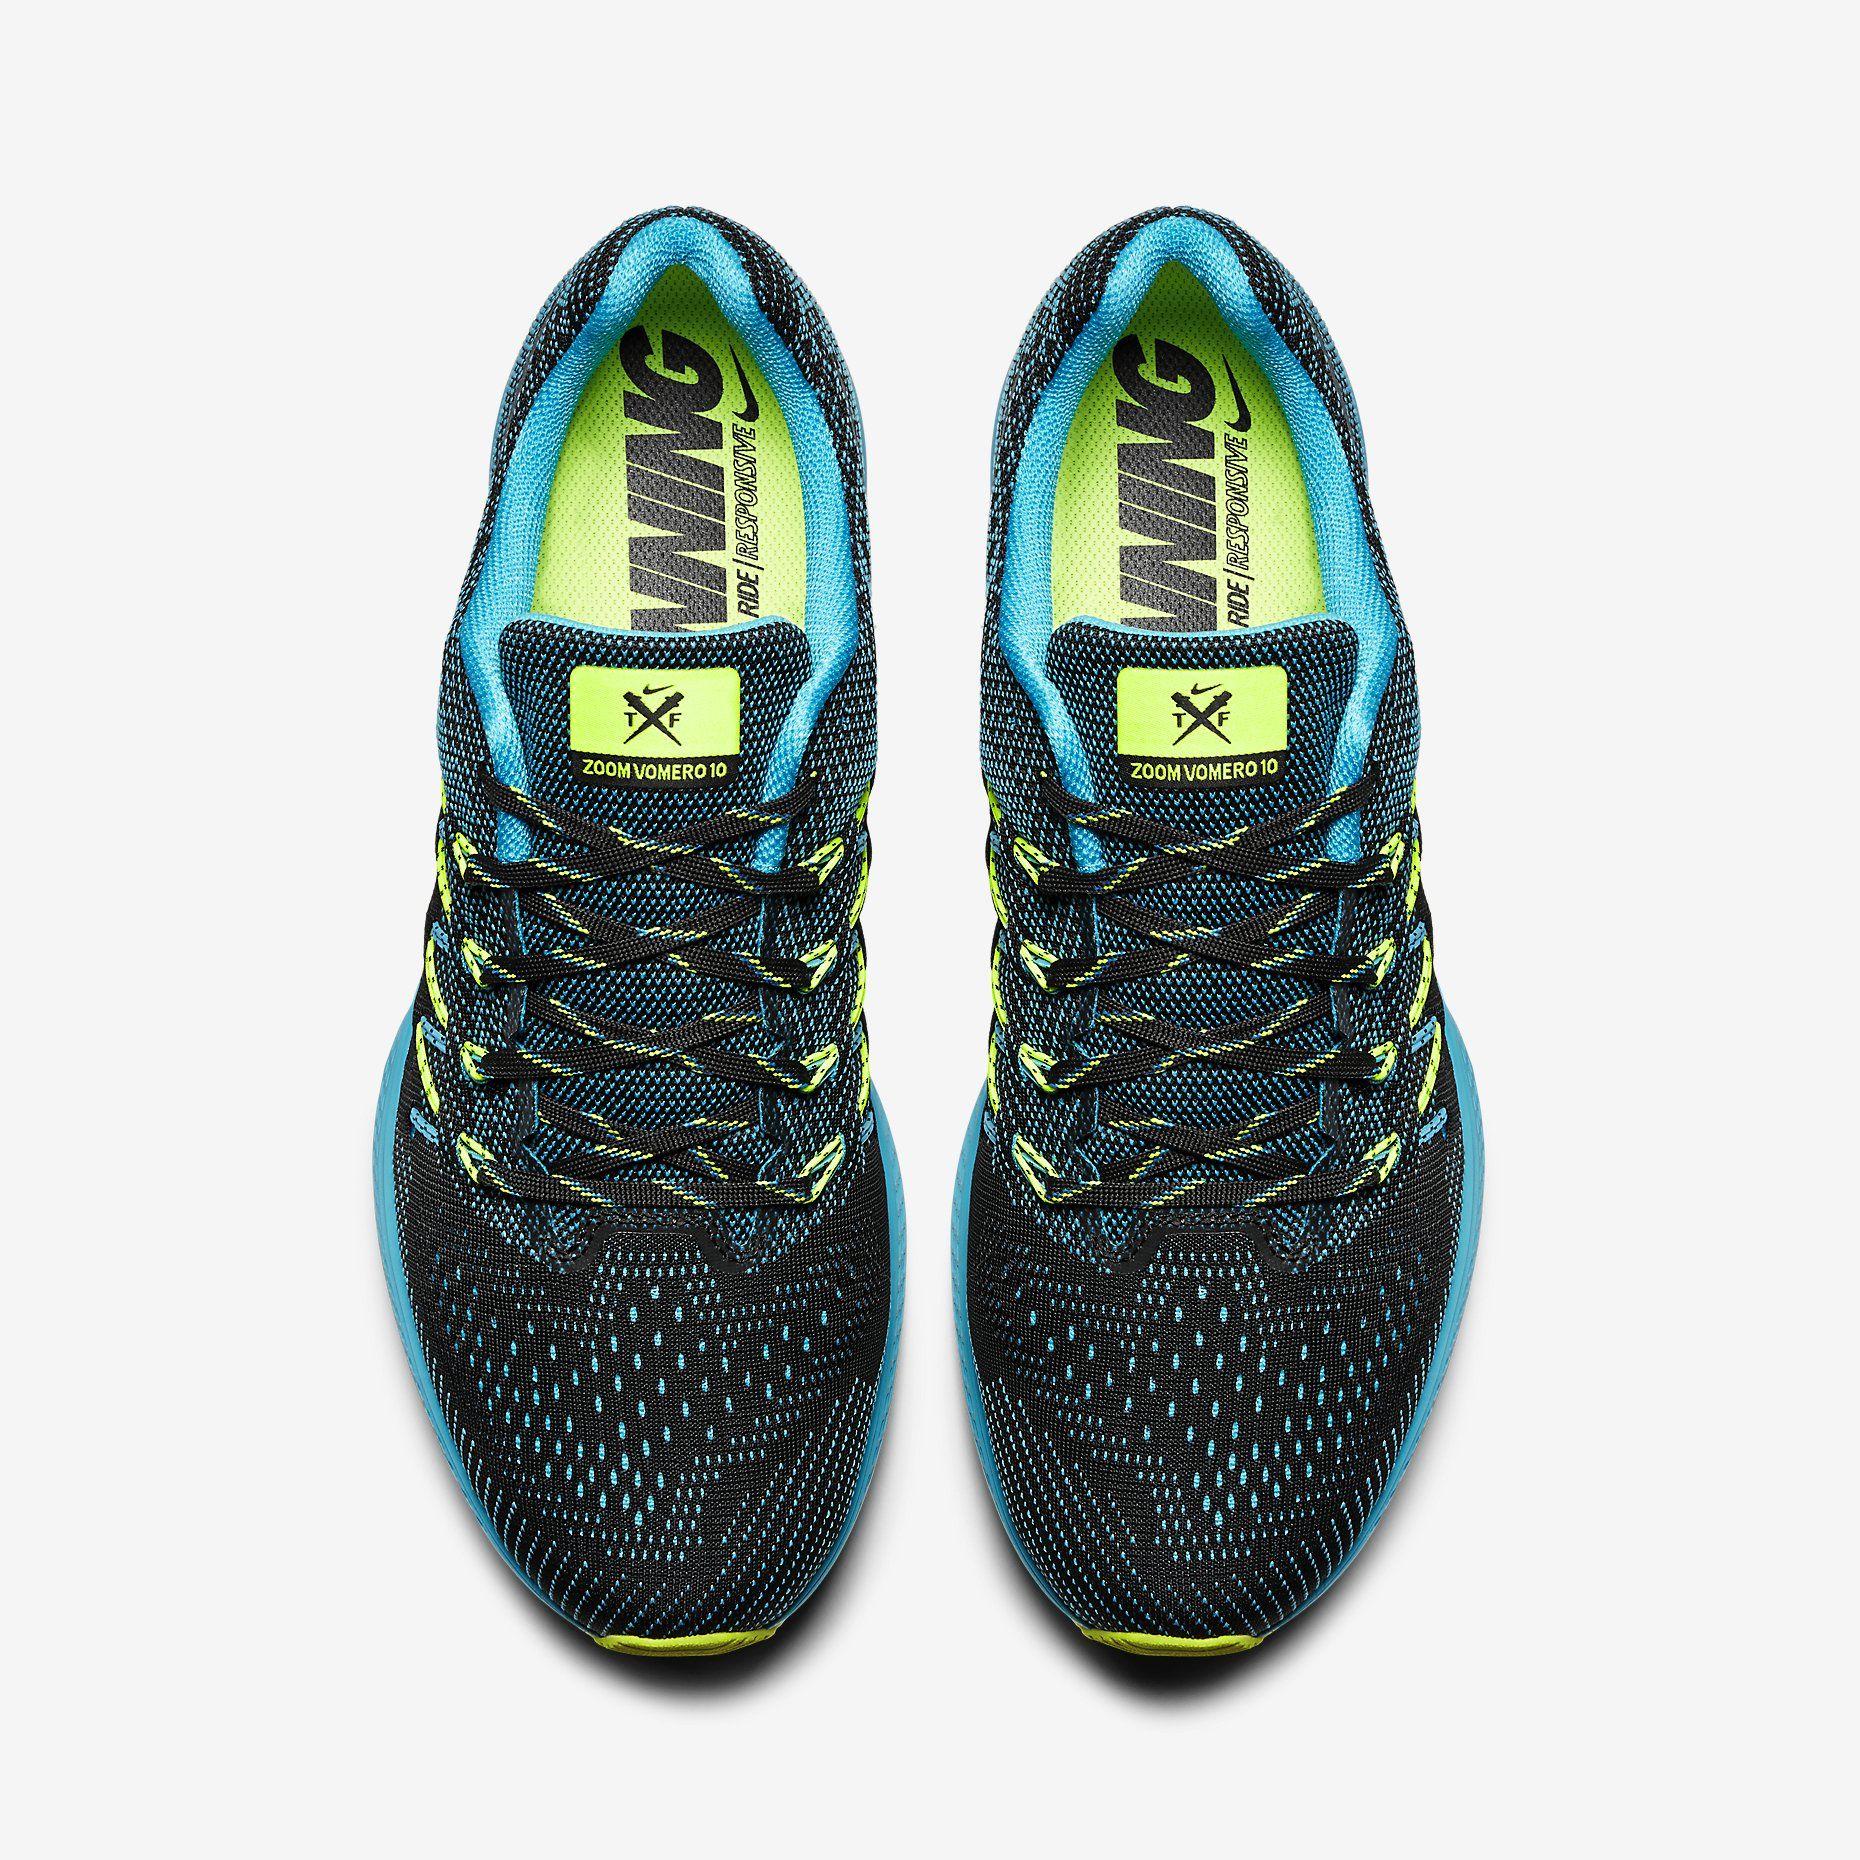 papi llenar Confiar  Nike Air Zoom Vomero 10 Men's Running Shoe. Nike Store UK | Zapas,  Indumentaria